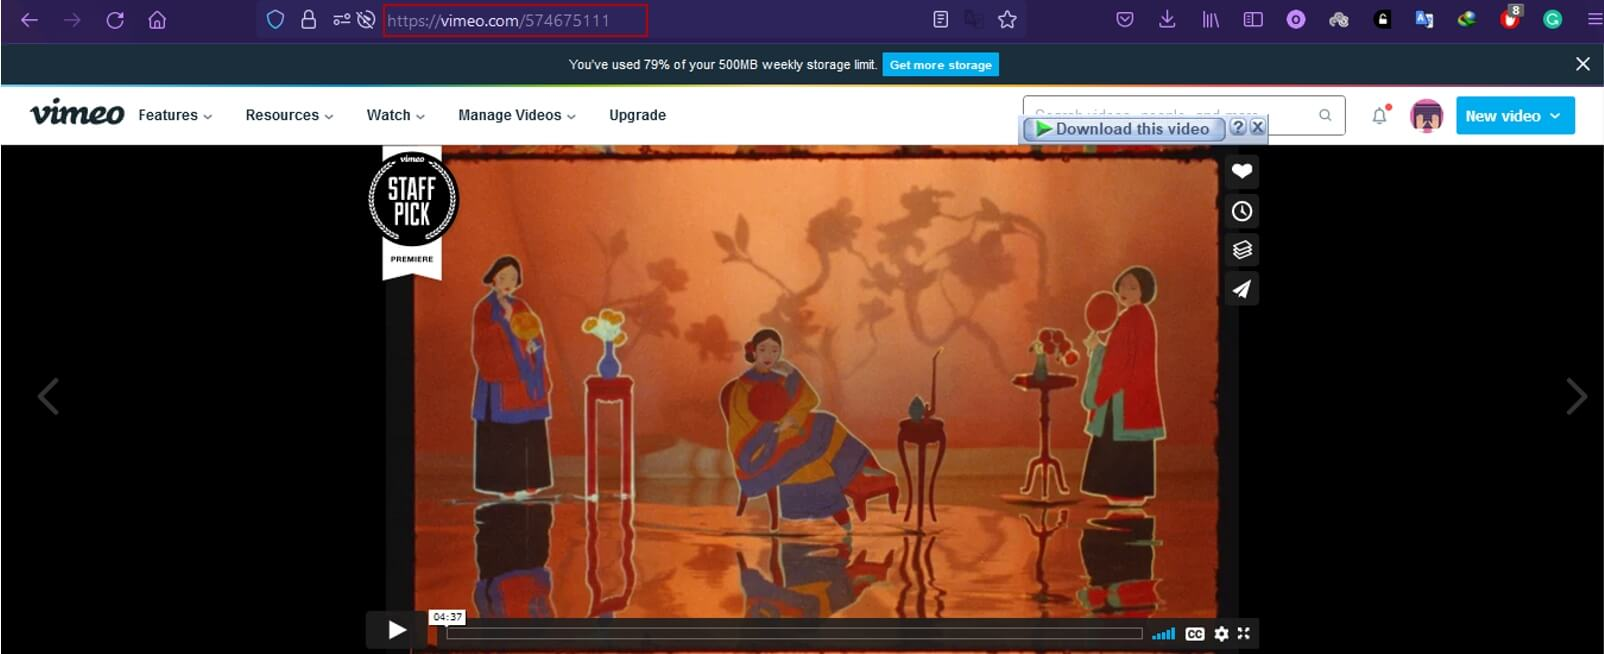 copy vimeo video link